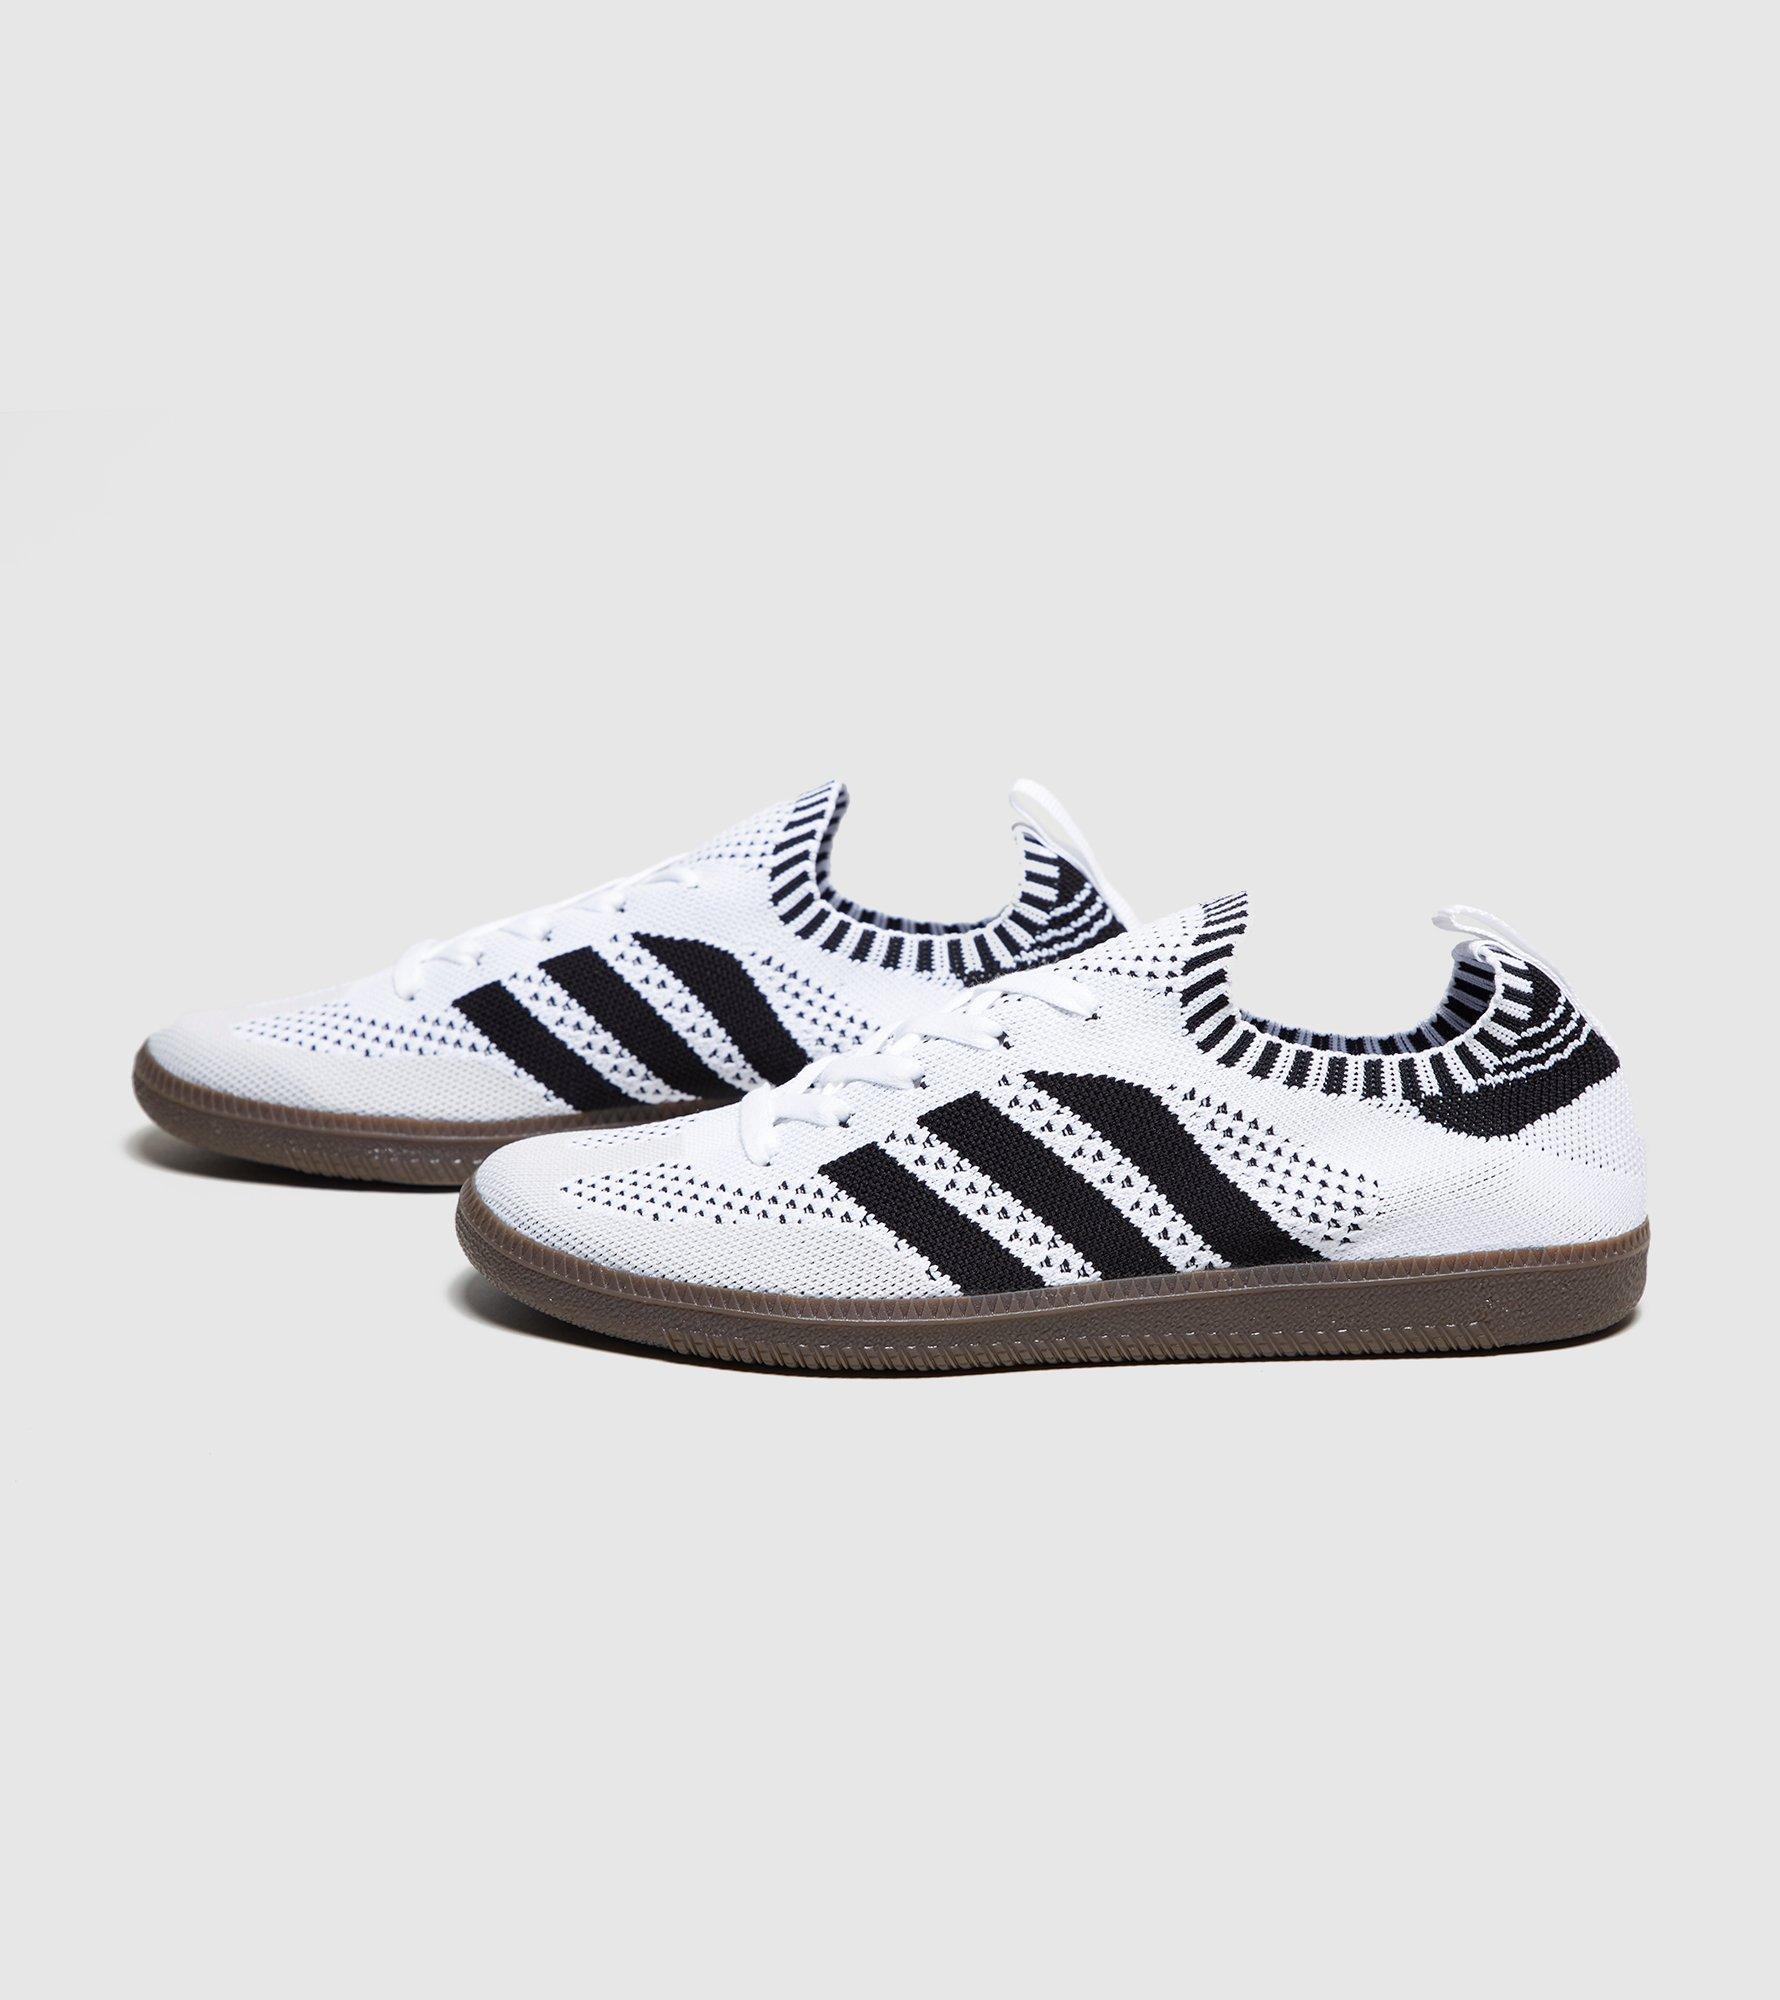 adidas Originals Samba Primeknit in White for Men - Lyst ddef7d82e